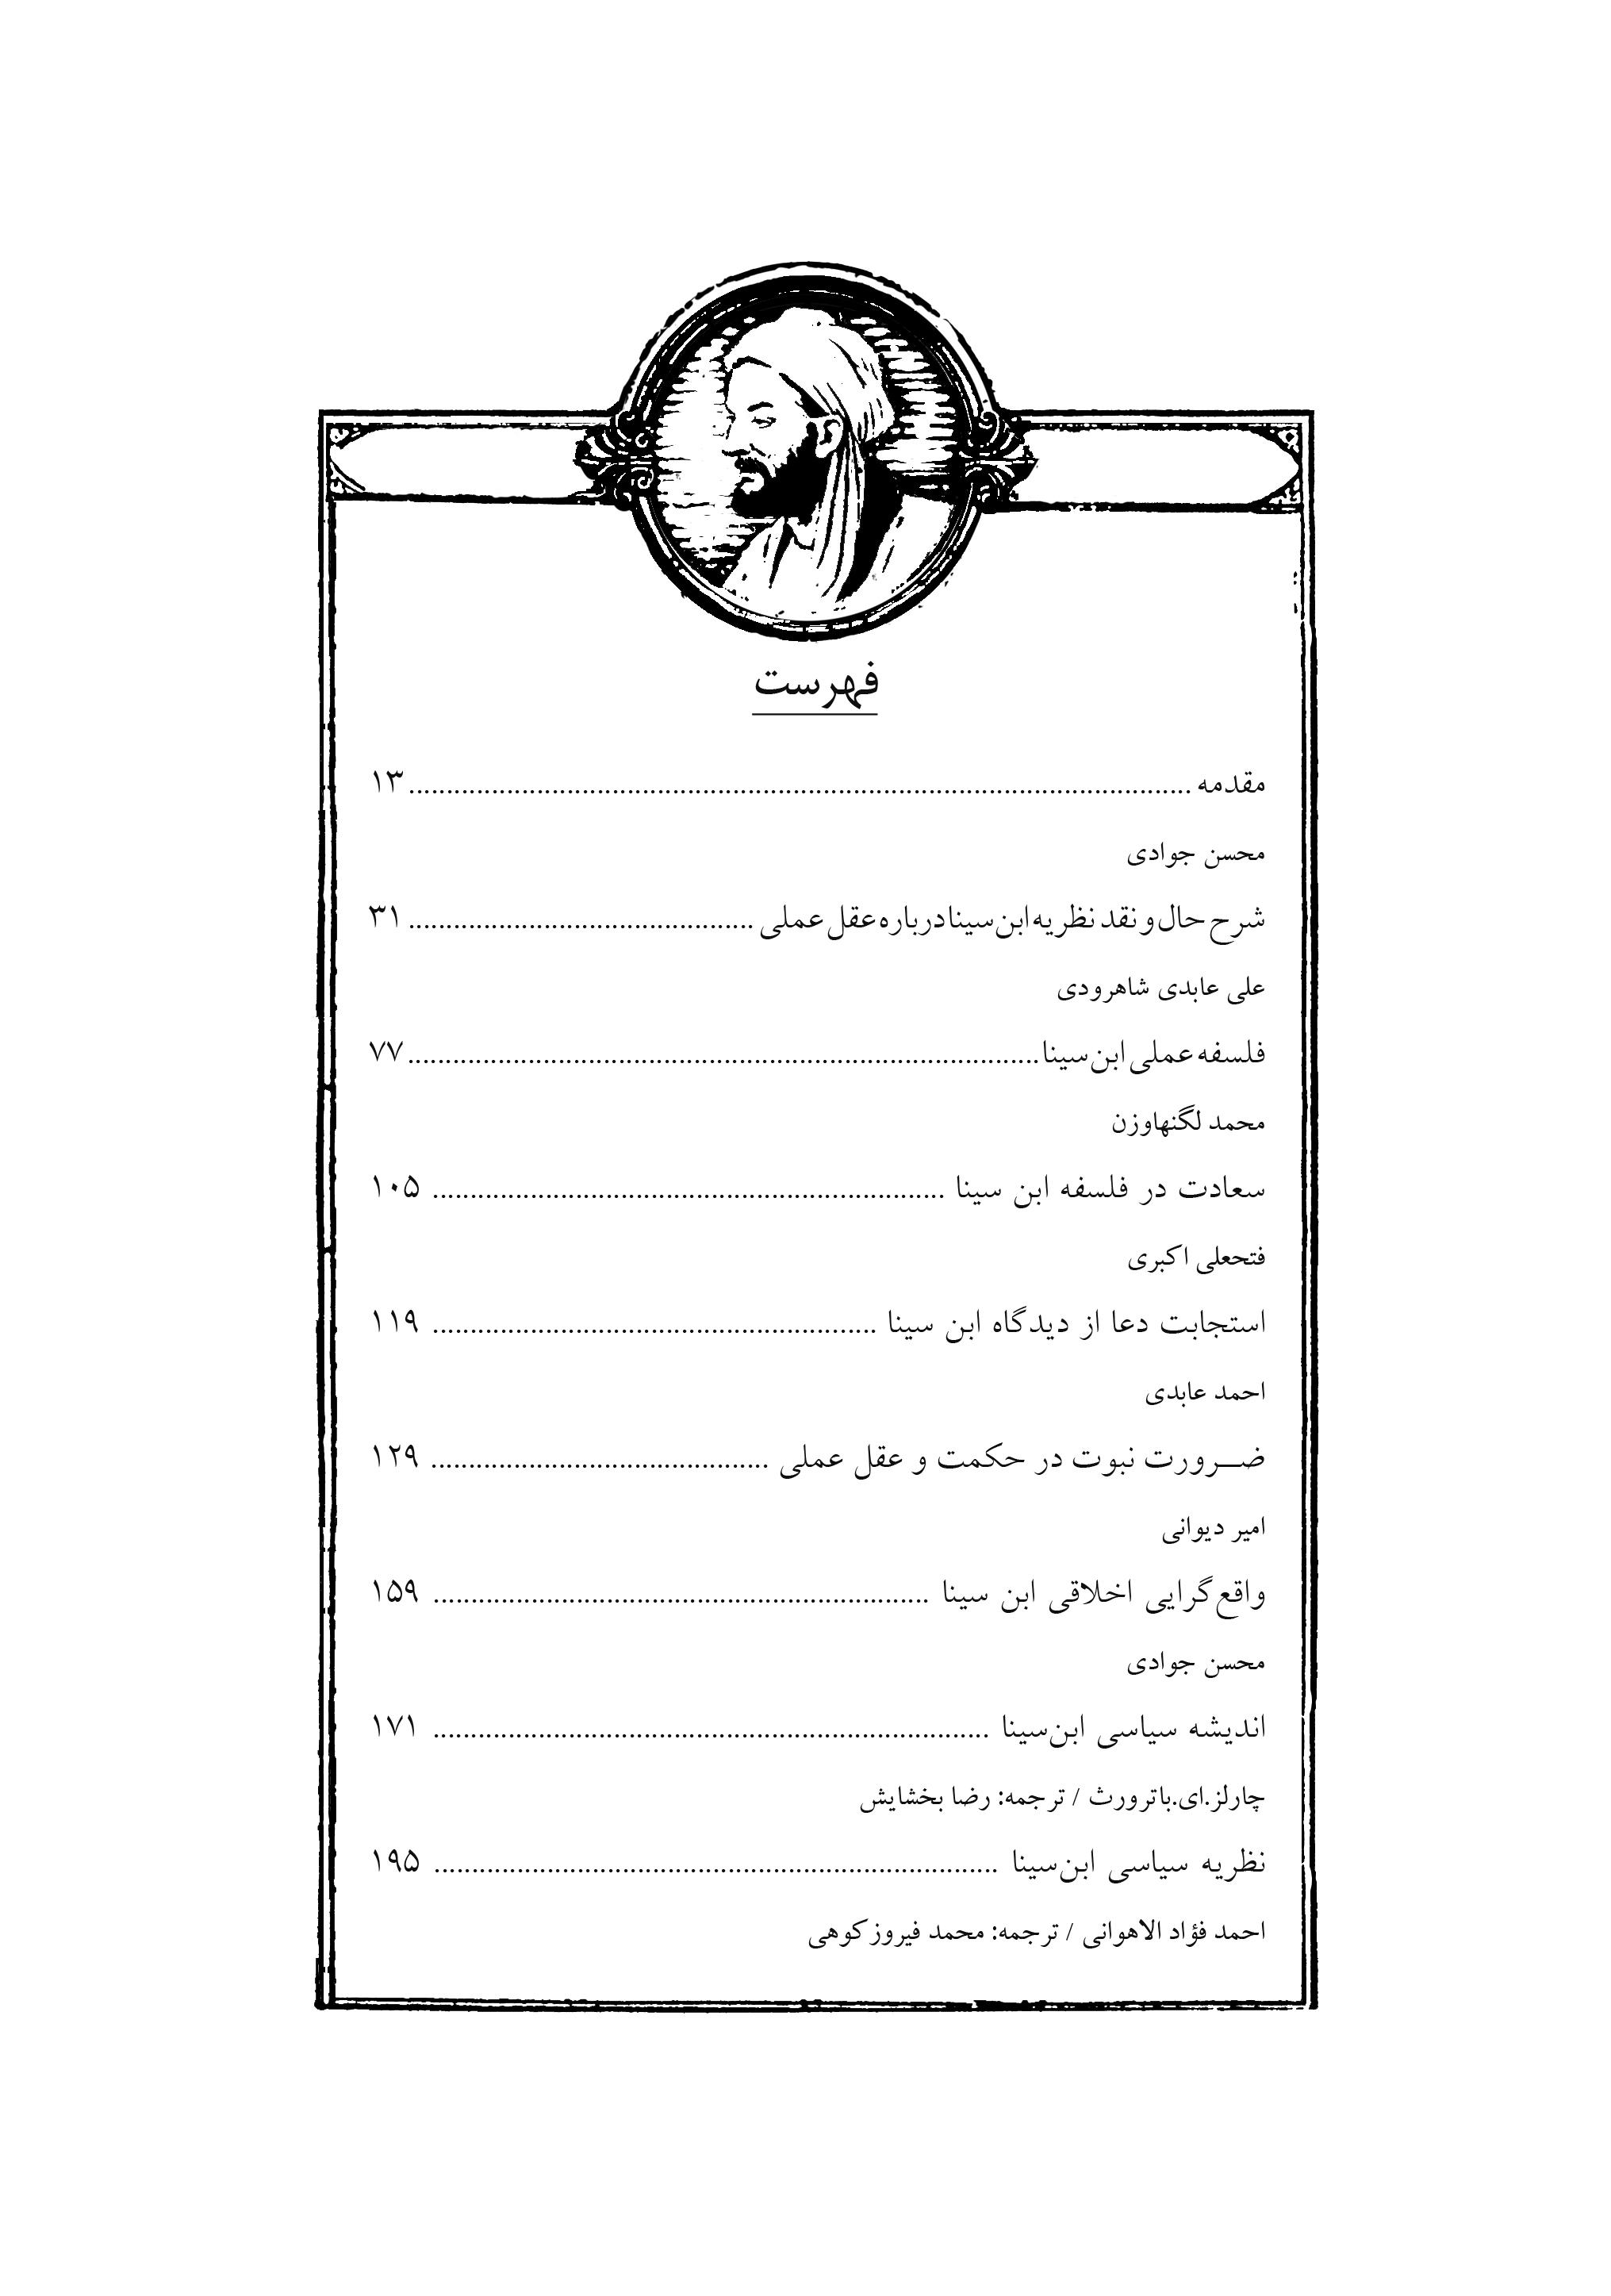 http://www.buali.ir/buali_content/media/image/2021/07/2718_orig.jpg?t=637622034092864733